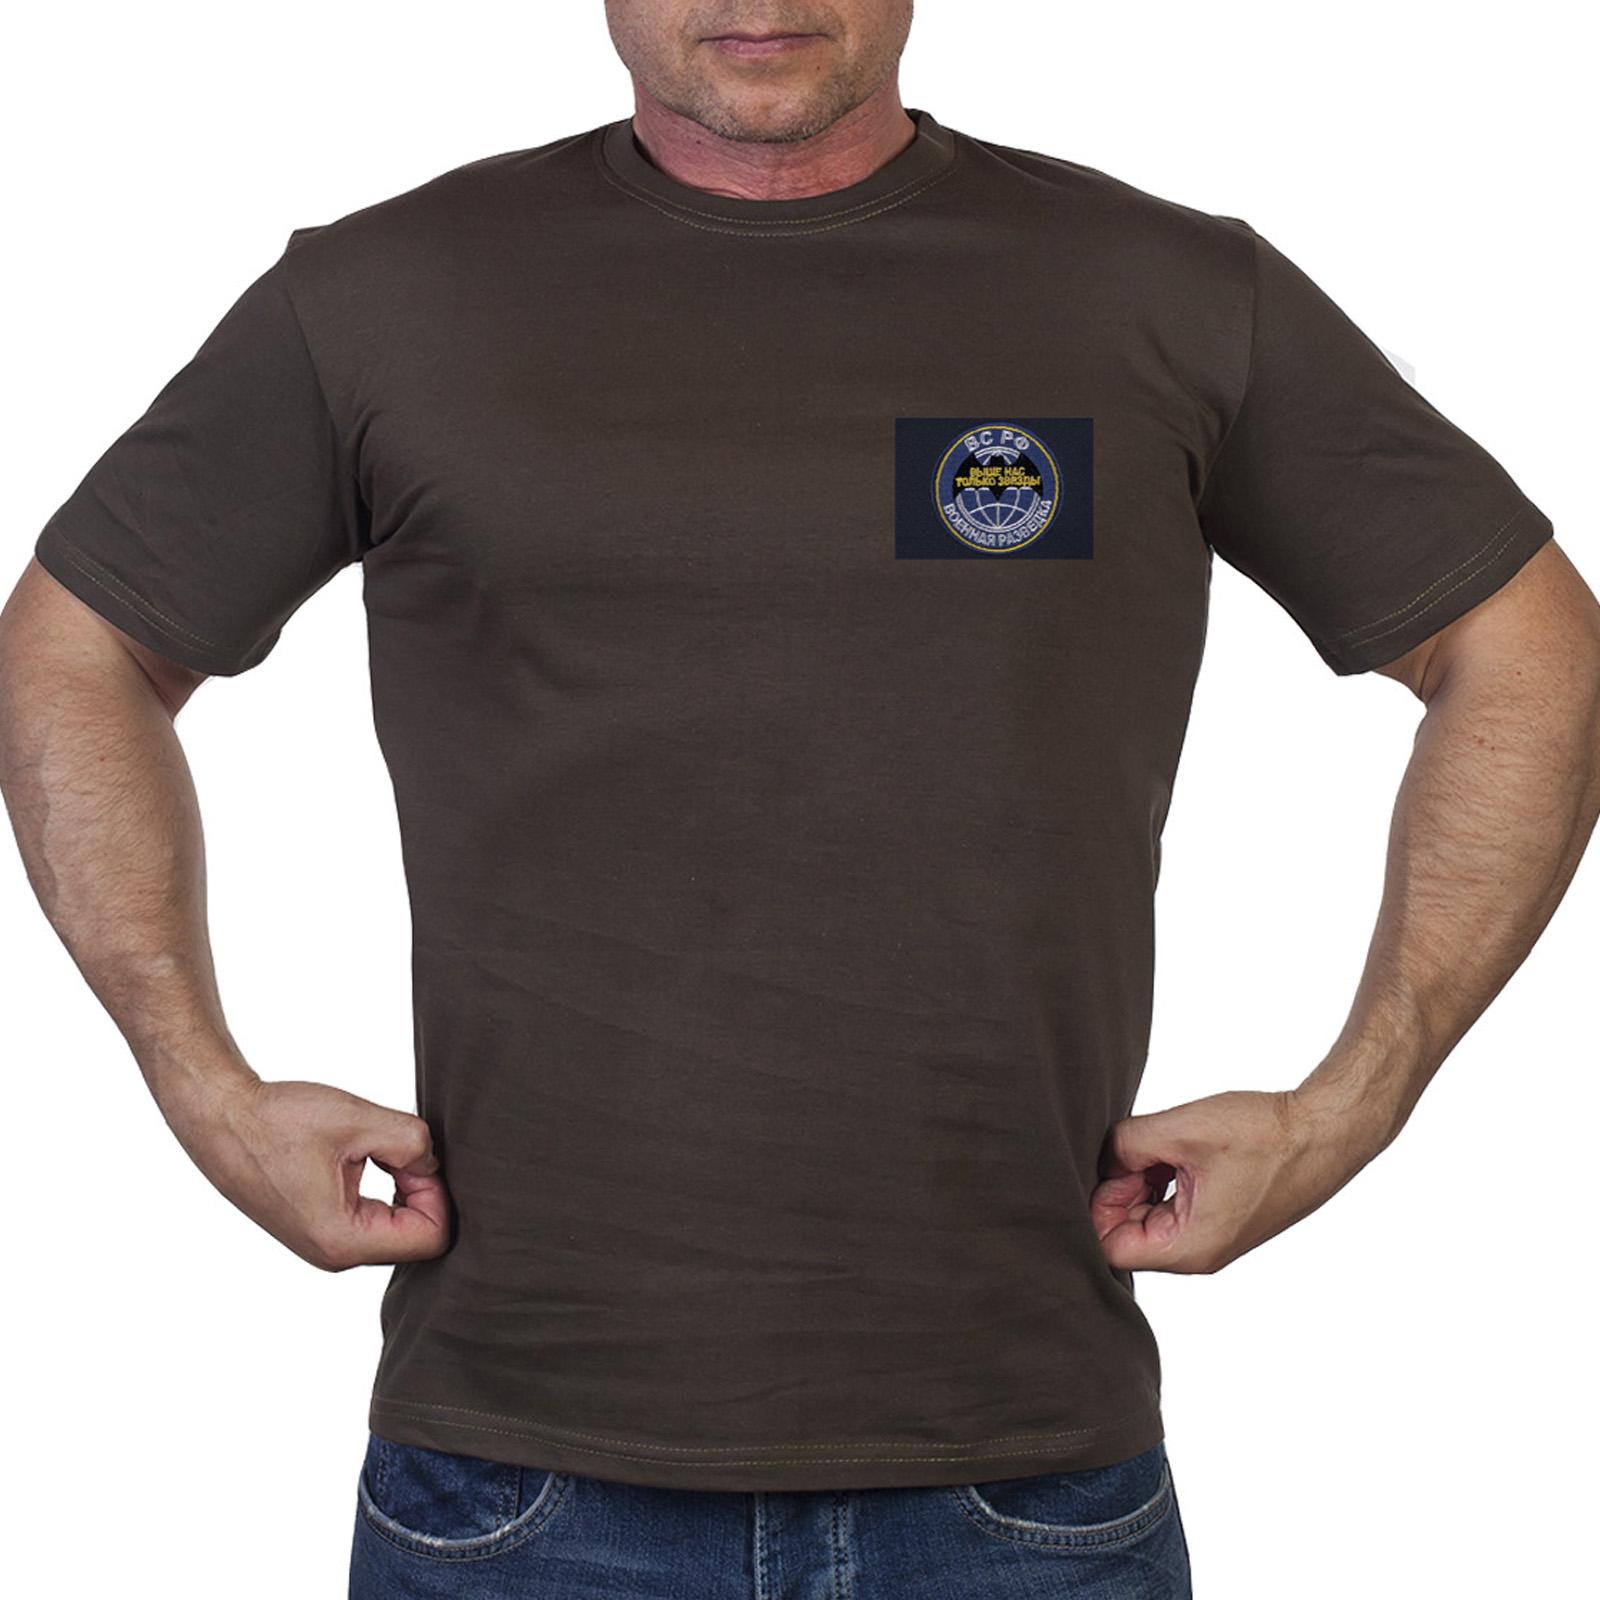 Зеленая мужская футболка Военная разведка